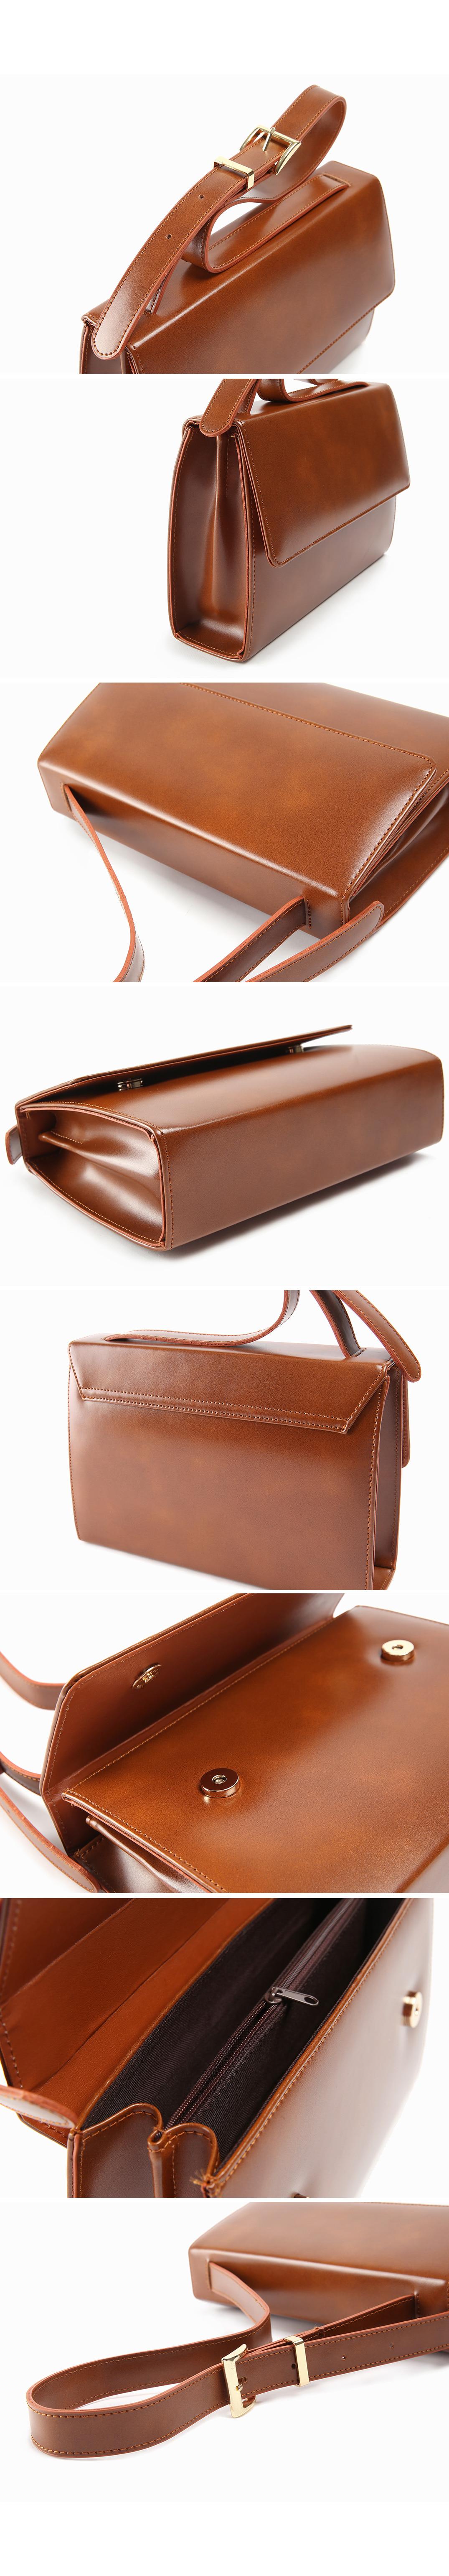 loss square bag